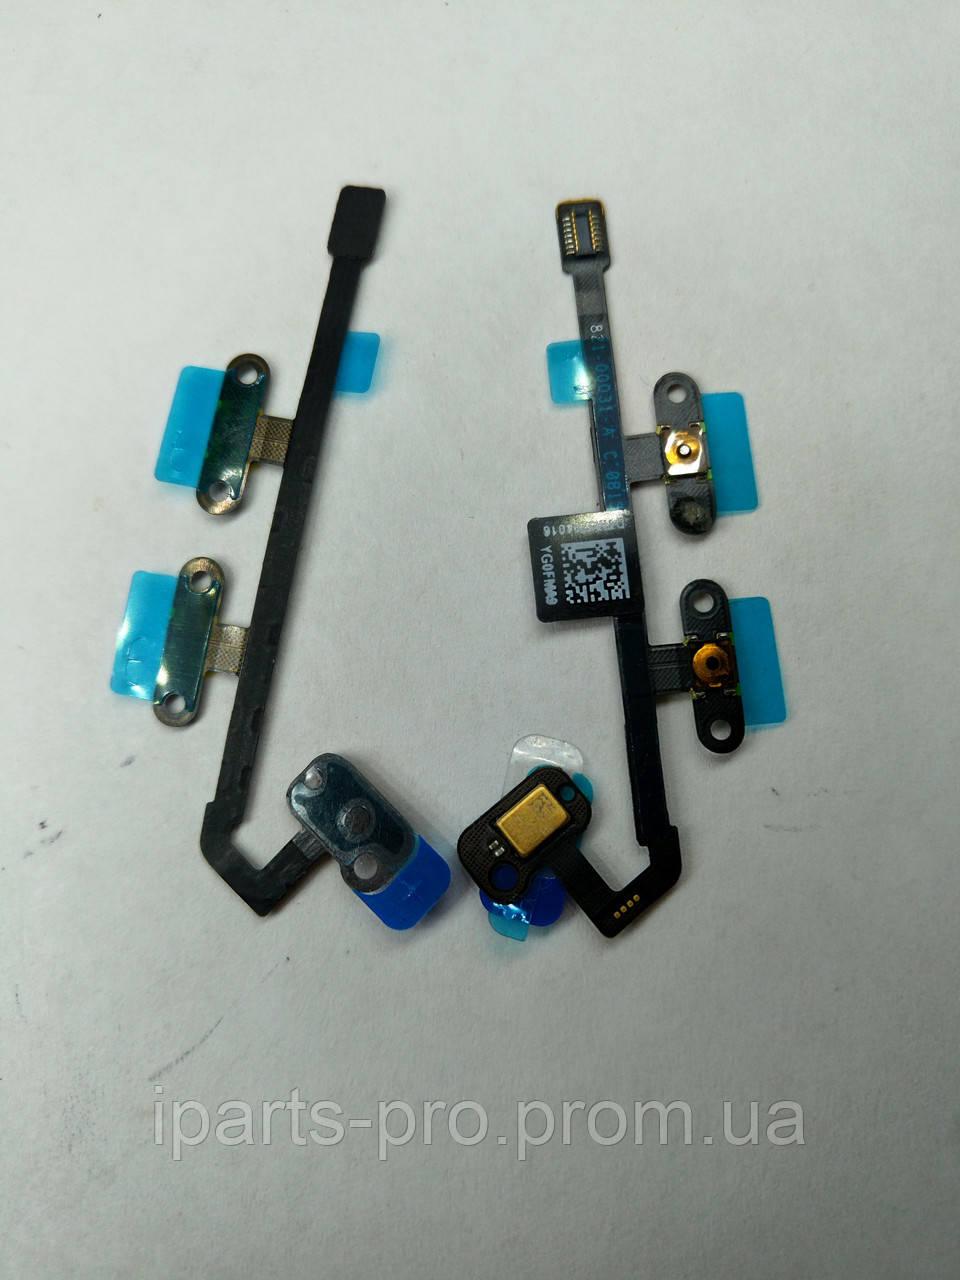 Шлейф для iPad 6 (Air 2) volume control flex cable